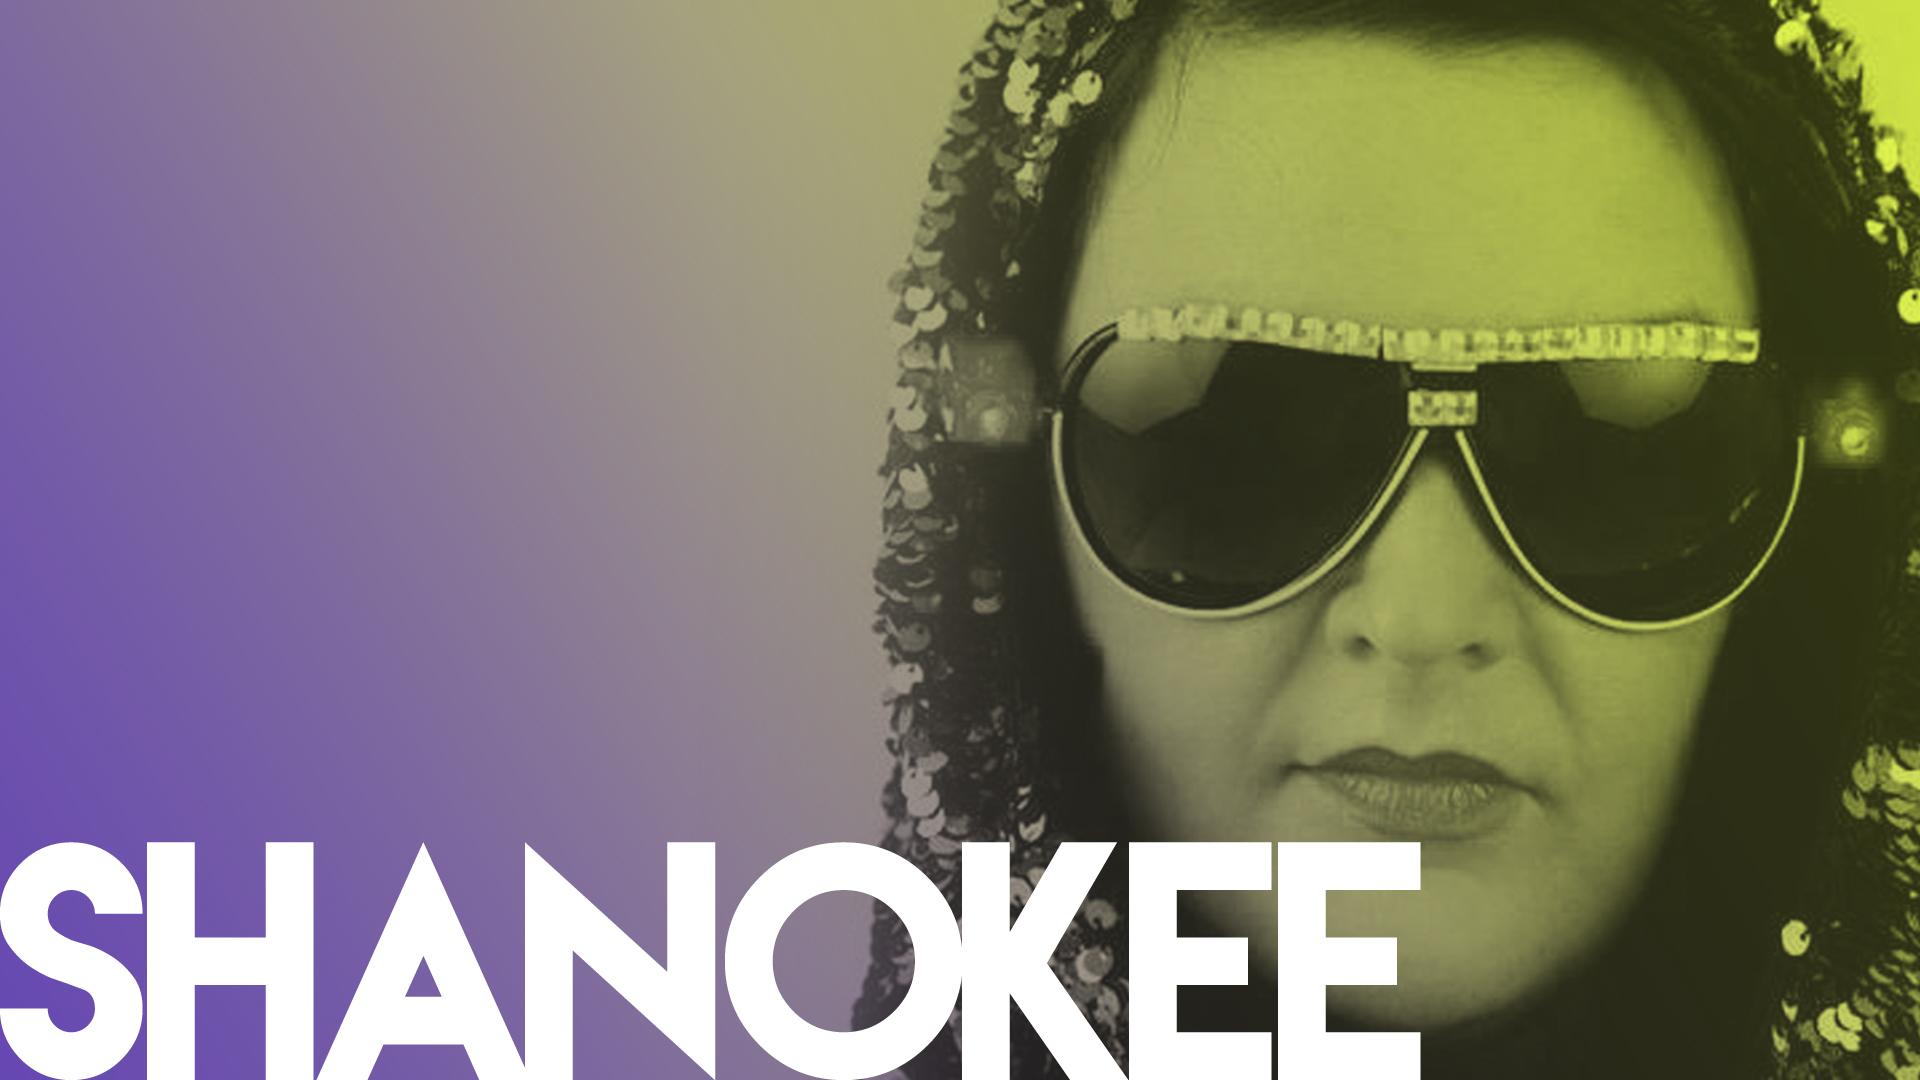 Shanokee